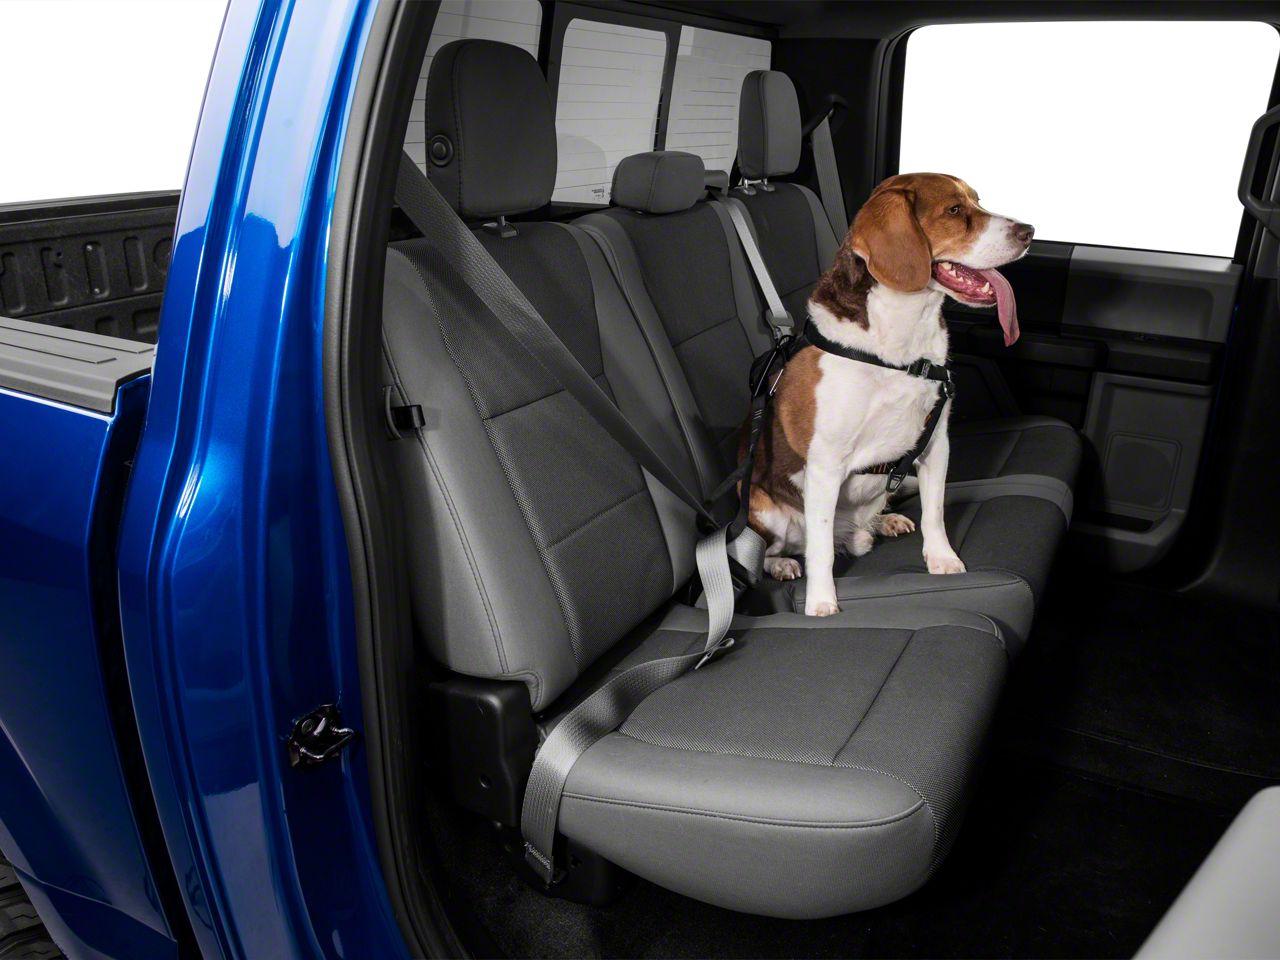 Kurgo Extended Strength Tru-Fit Dog Harness w/ Seat Belt Tether - Black (97-18 F-150)